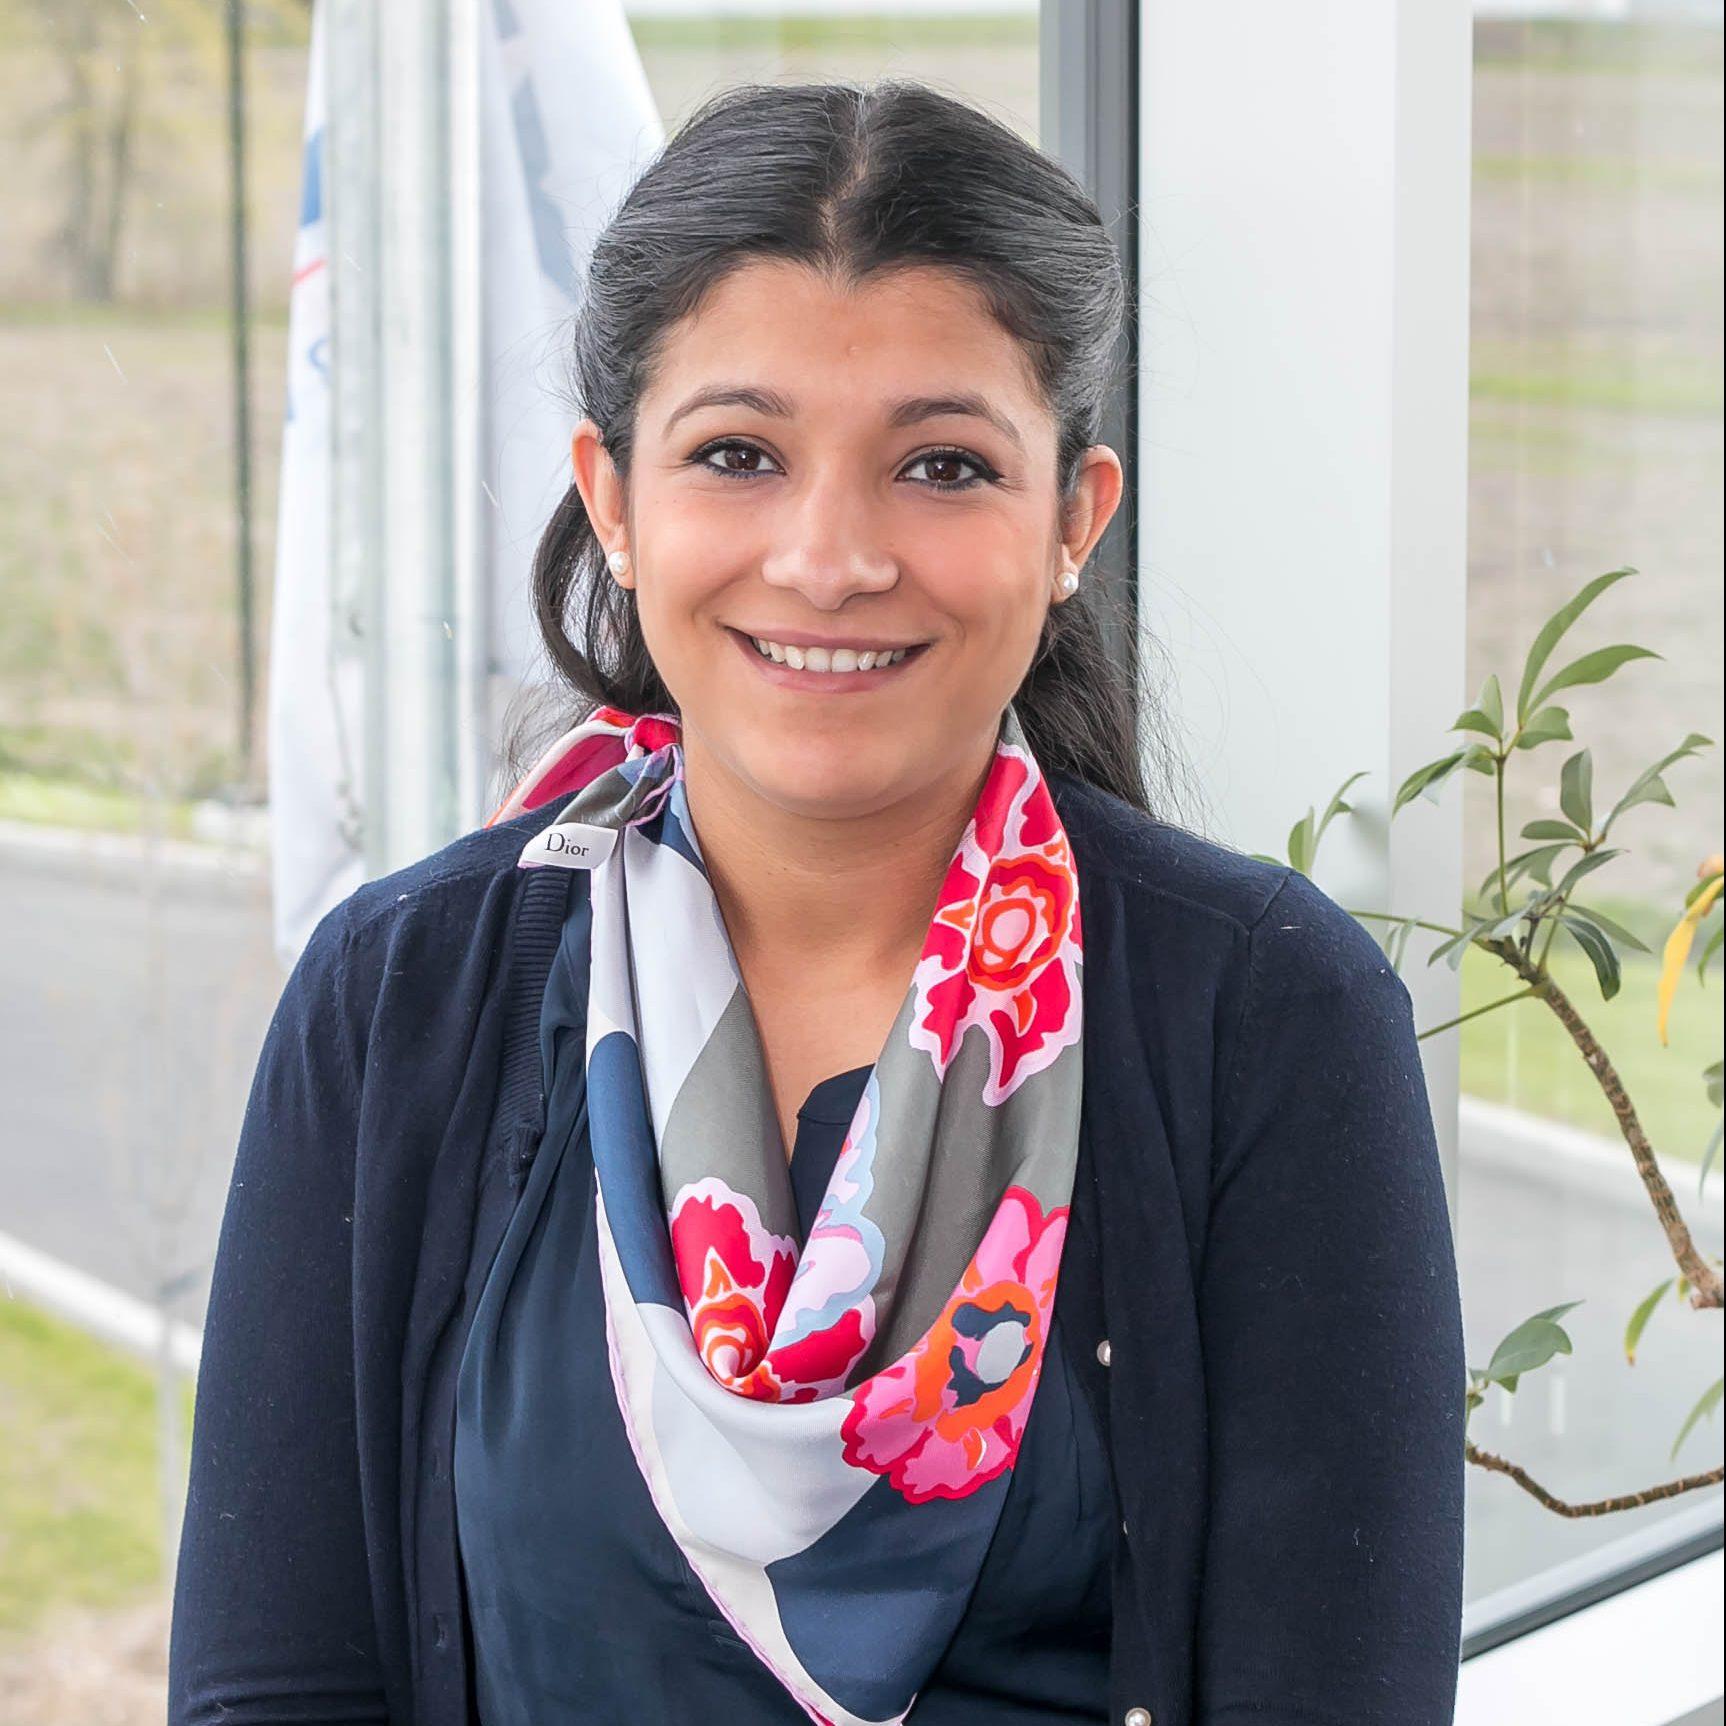 Yasmine Abdelfadel